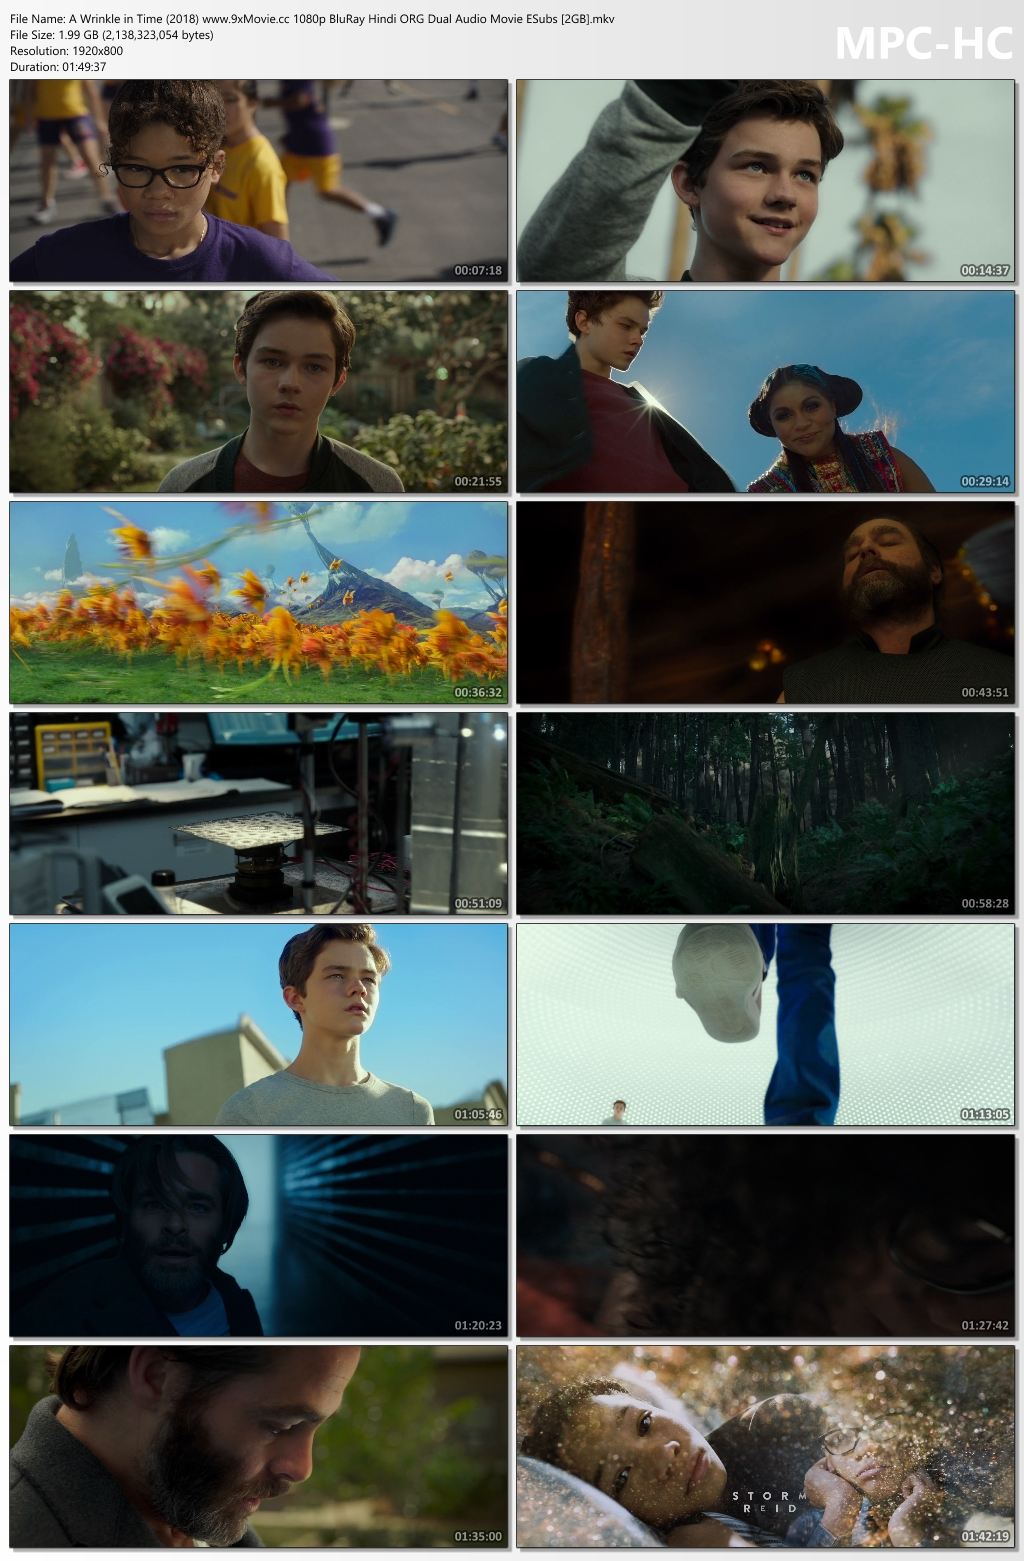 A-Wrinkle-in-Time-2018-www-9x-Movie-cc-1080p-Blu-Ray-Hindi-ORG-Dual-Audio-Movie-ESubs-2-GB-mkv